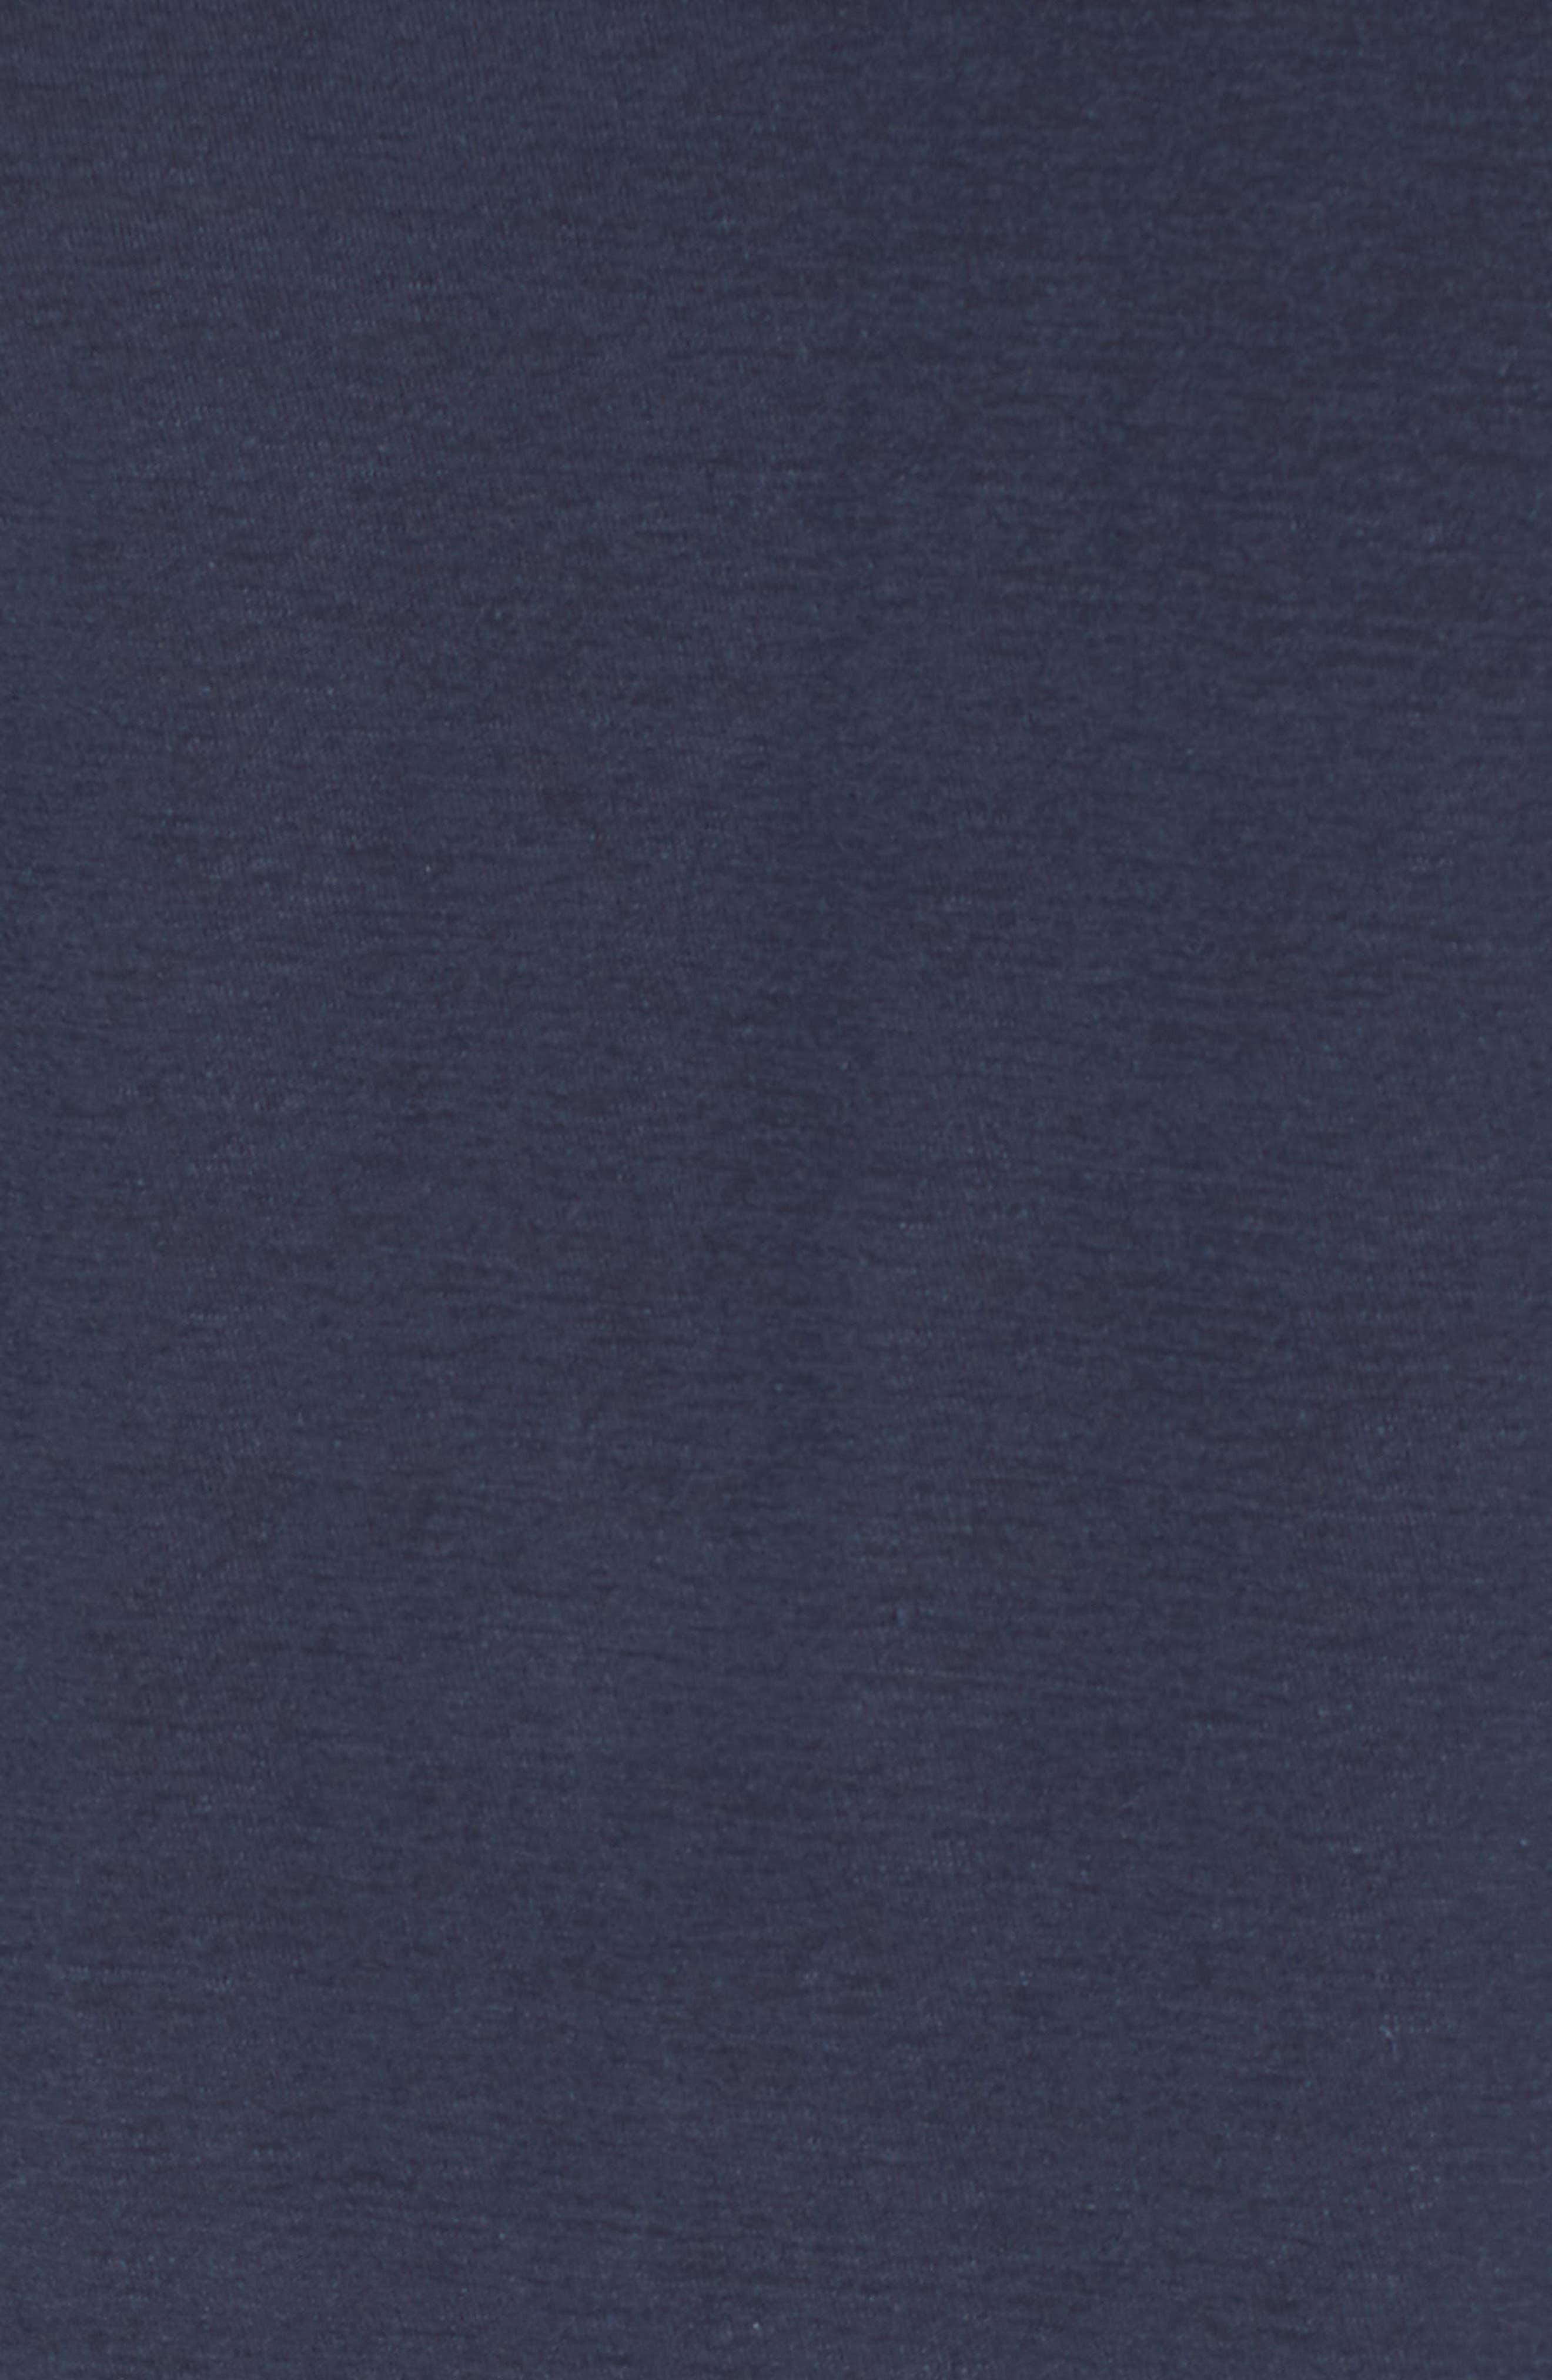 Regular Fit Slub Crewneck T-Shirt,                             Alternate thumbnail 5, color,                             Blue